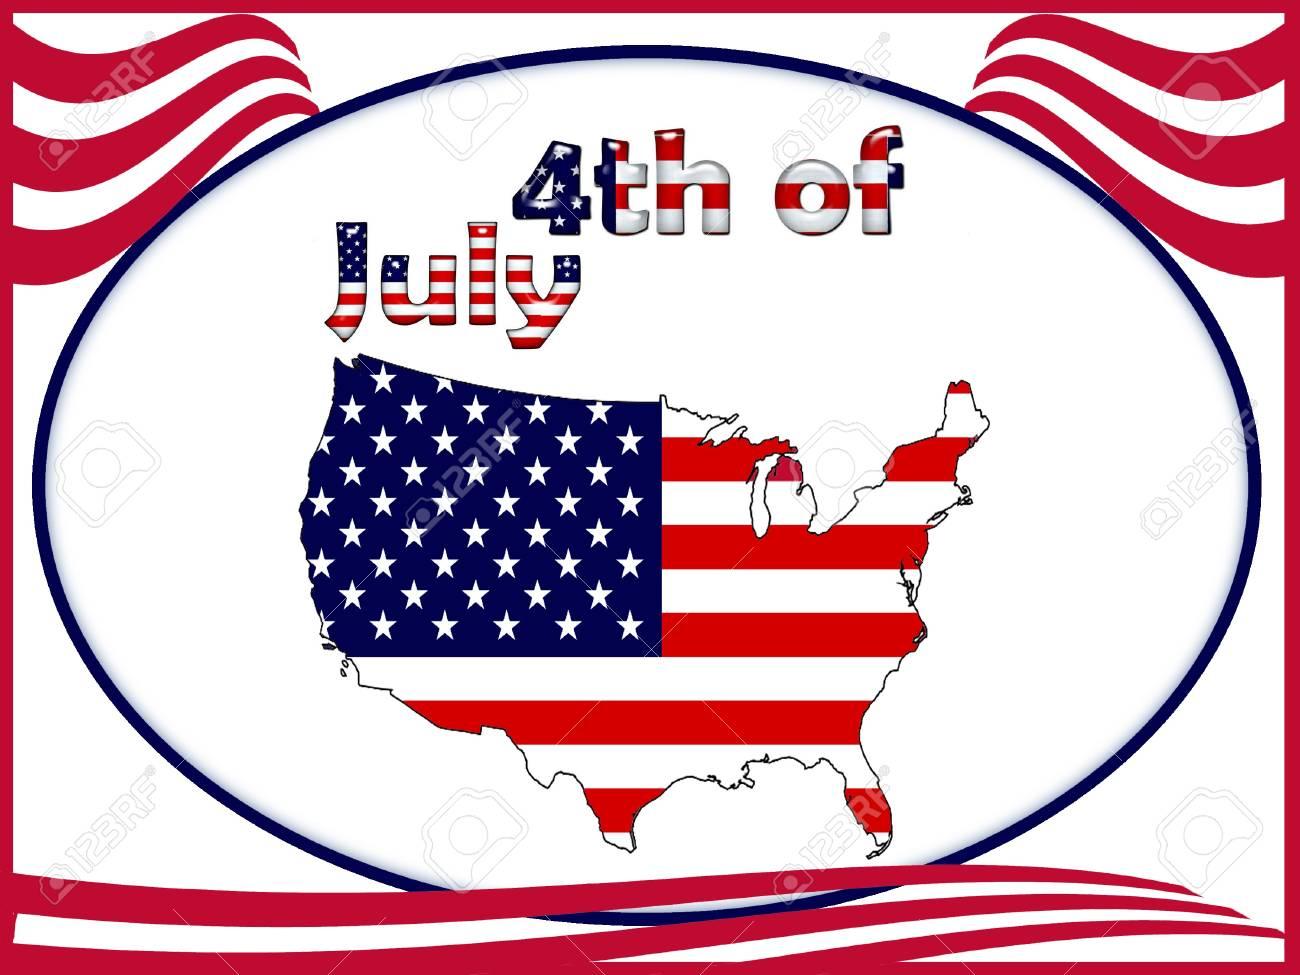 4th of july celebration Stock Photo - 17335933